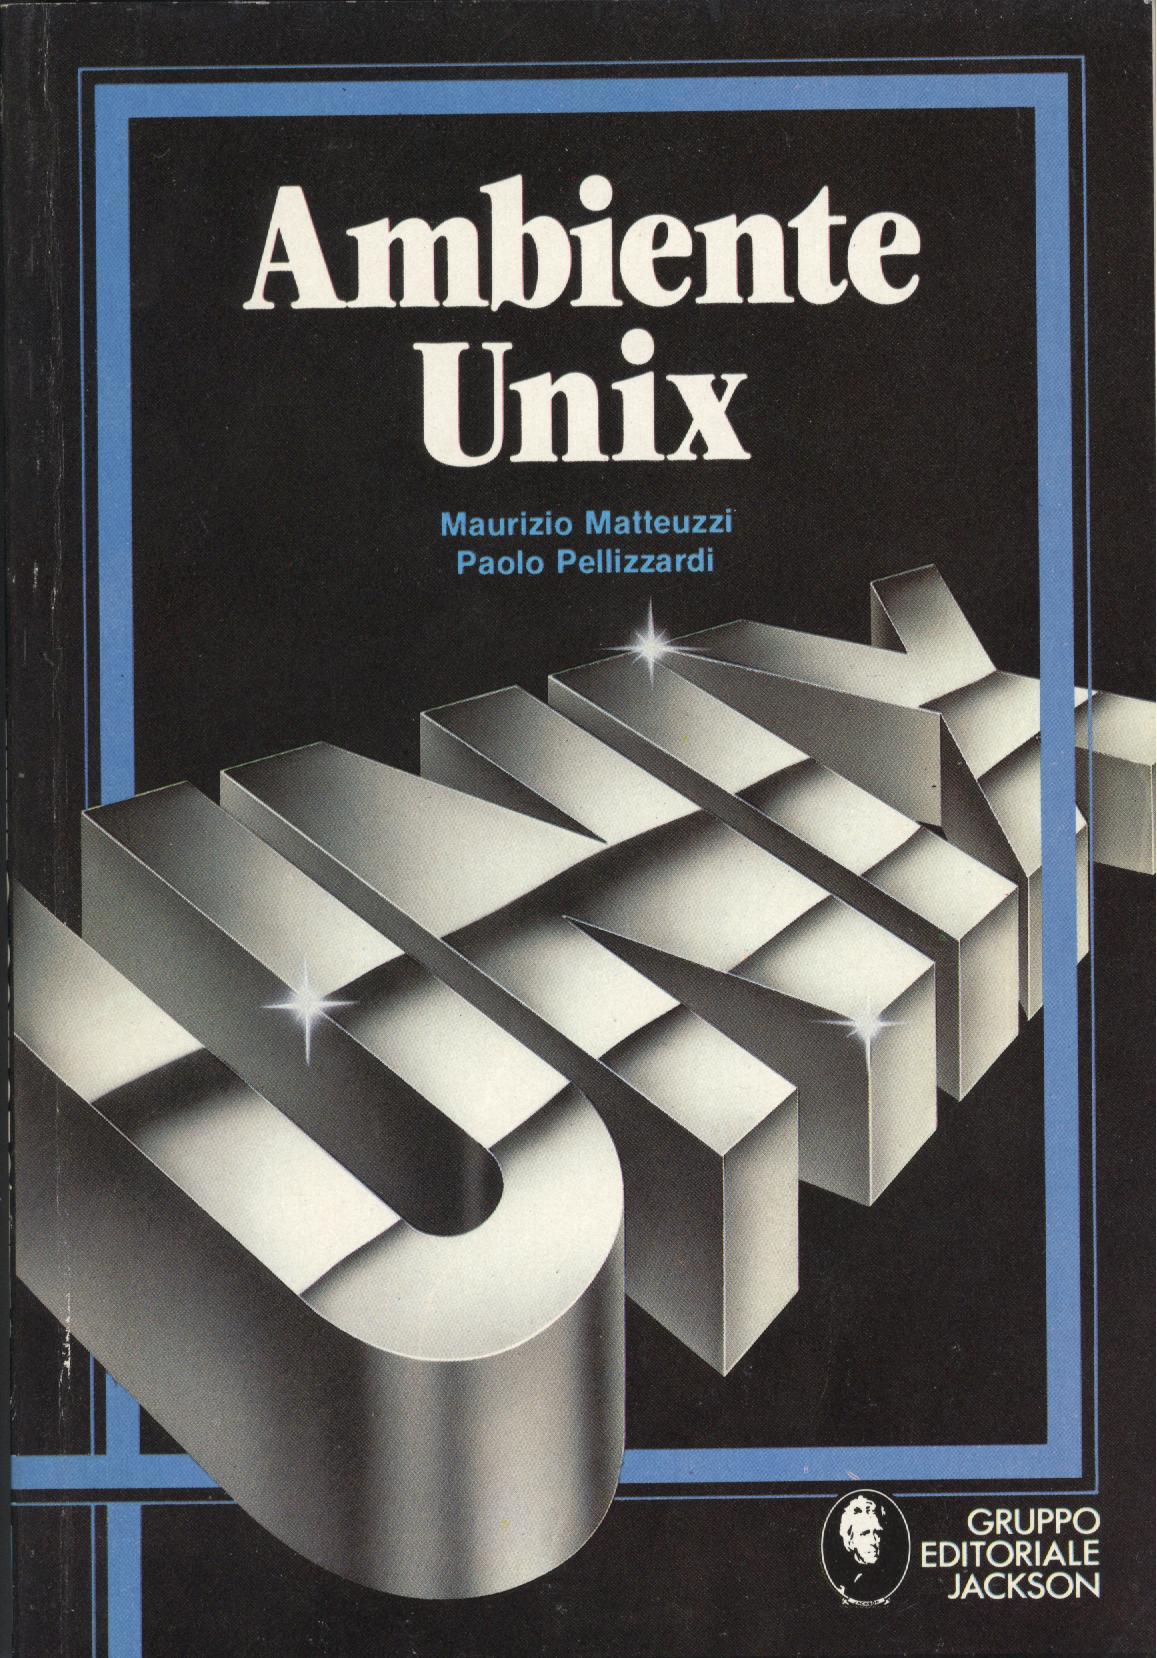 Ambiente UNIX